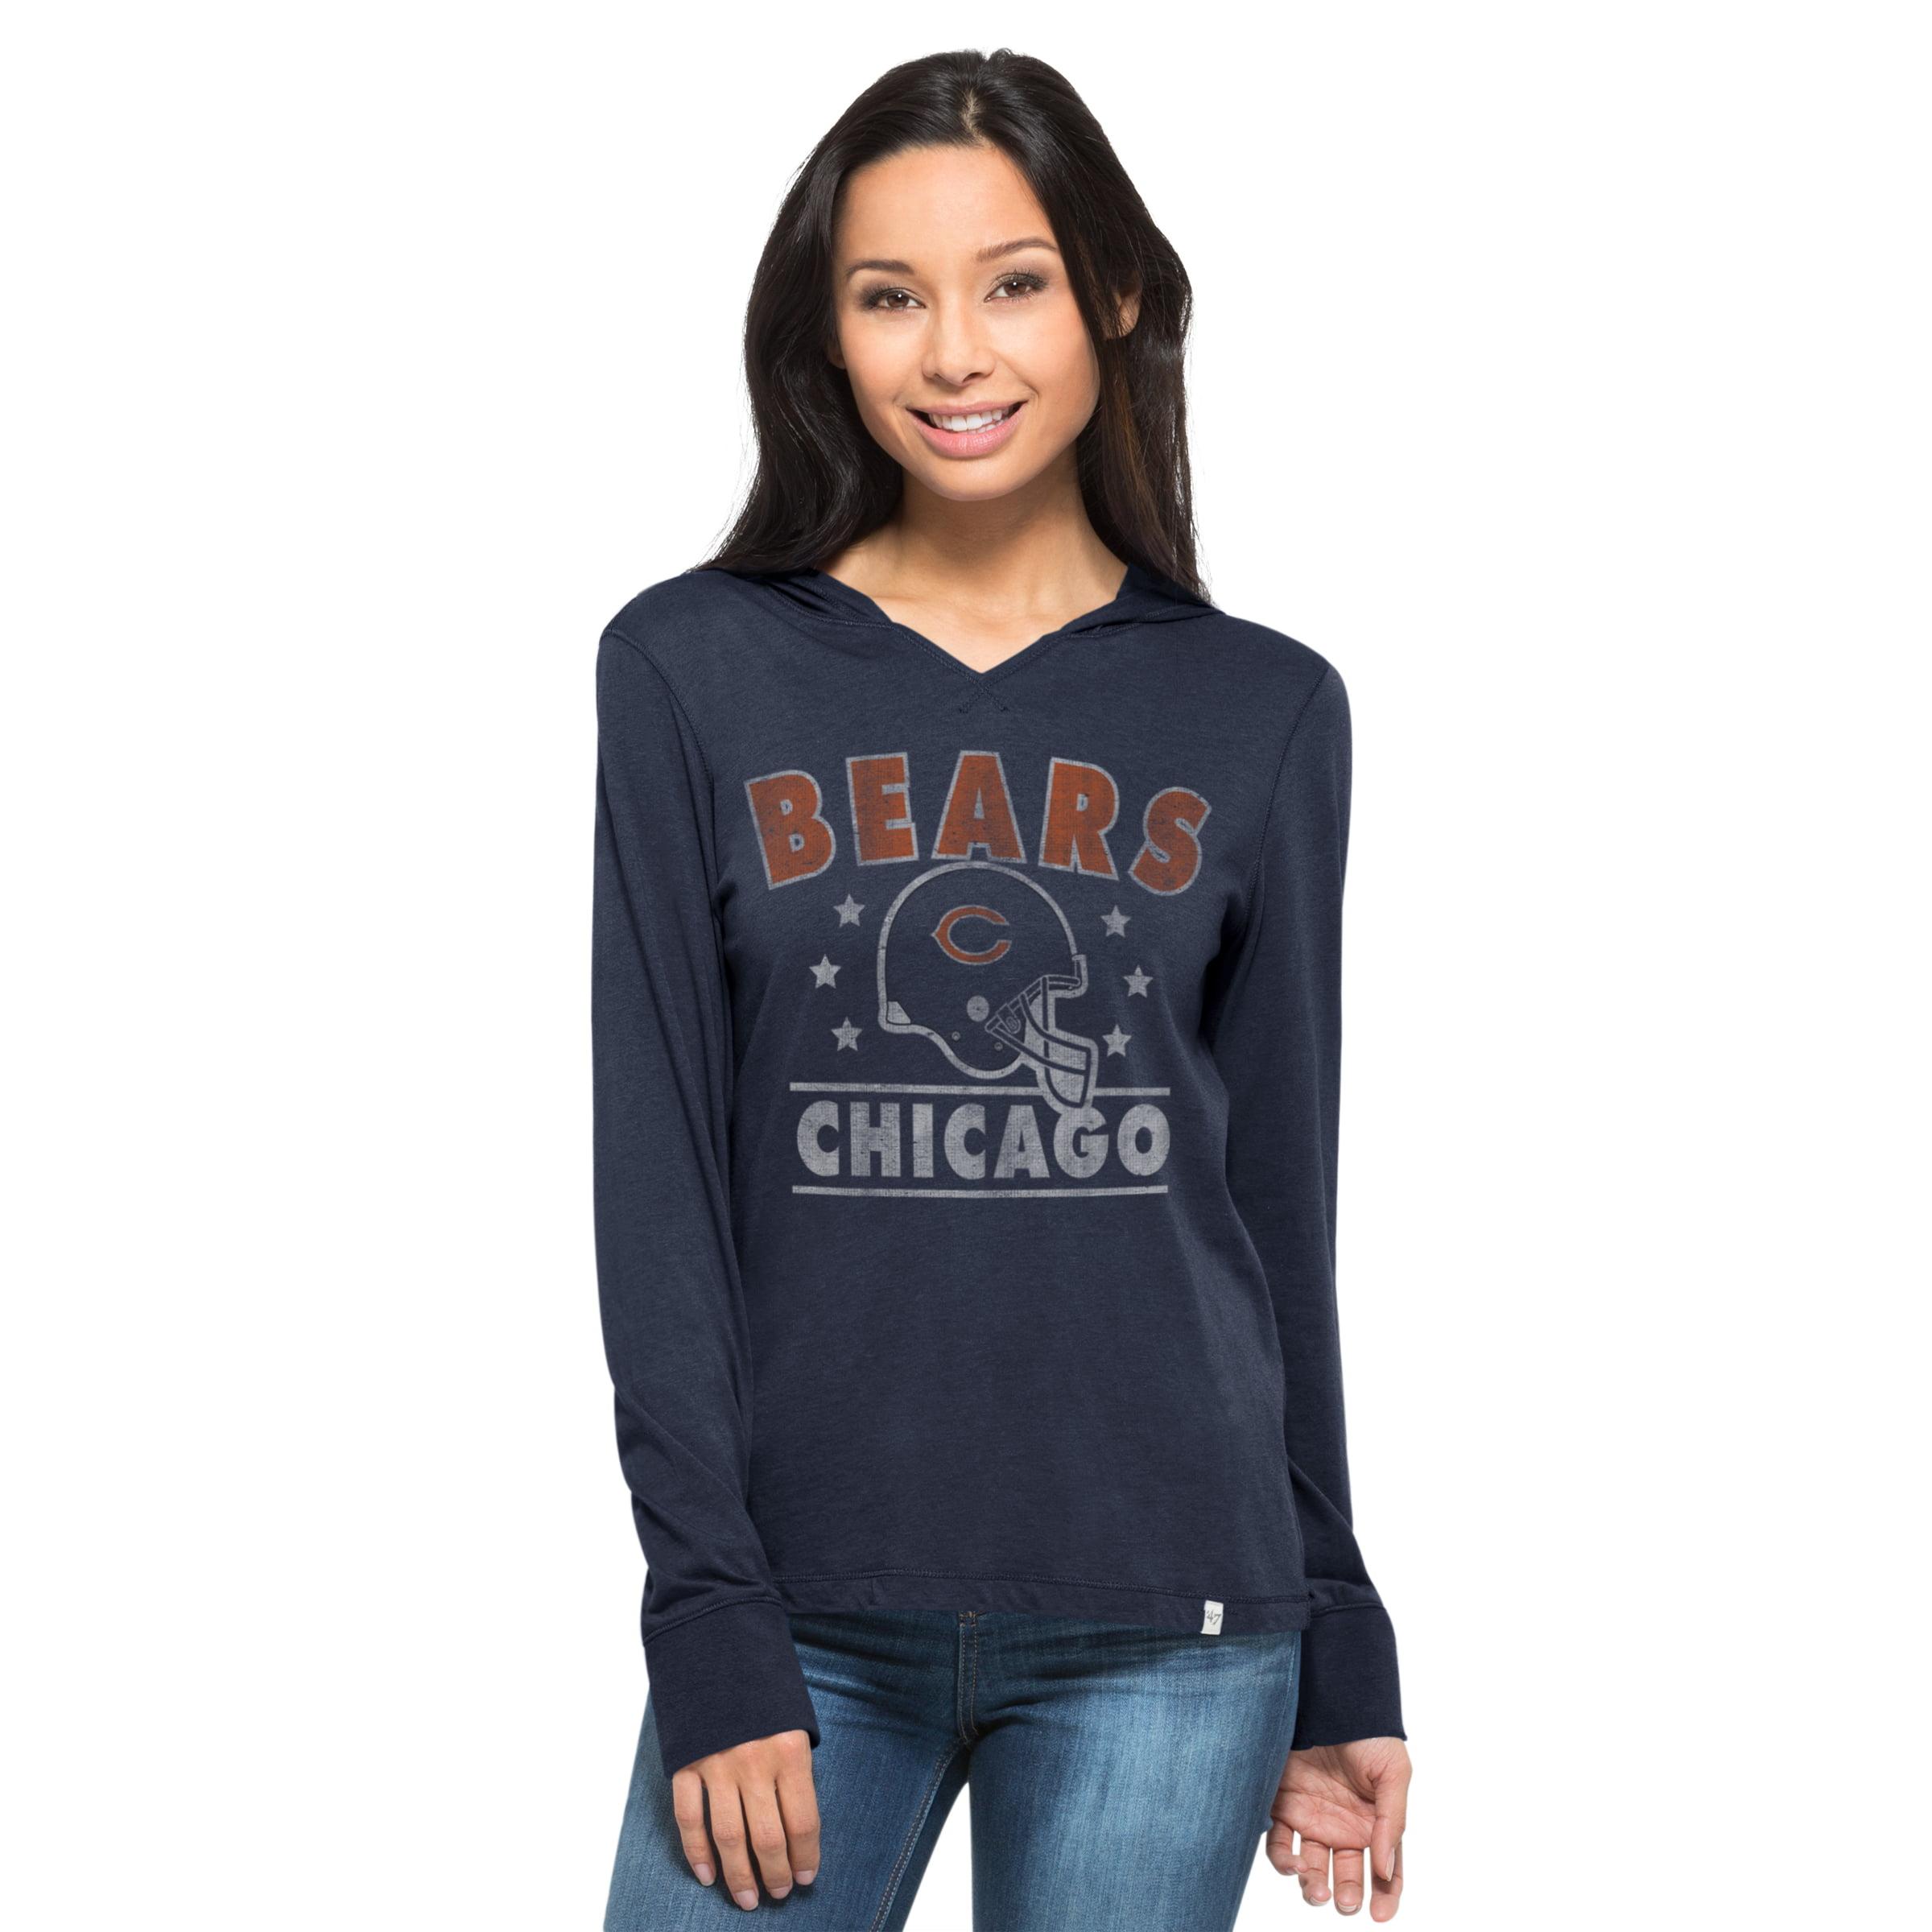 Chicago Bears Rebound Women's Regatta Blue Hooded L S Tee by 47 Brand